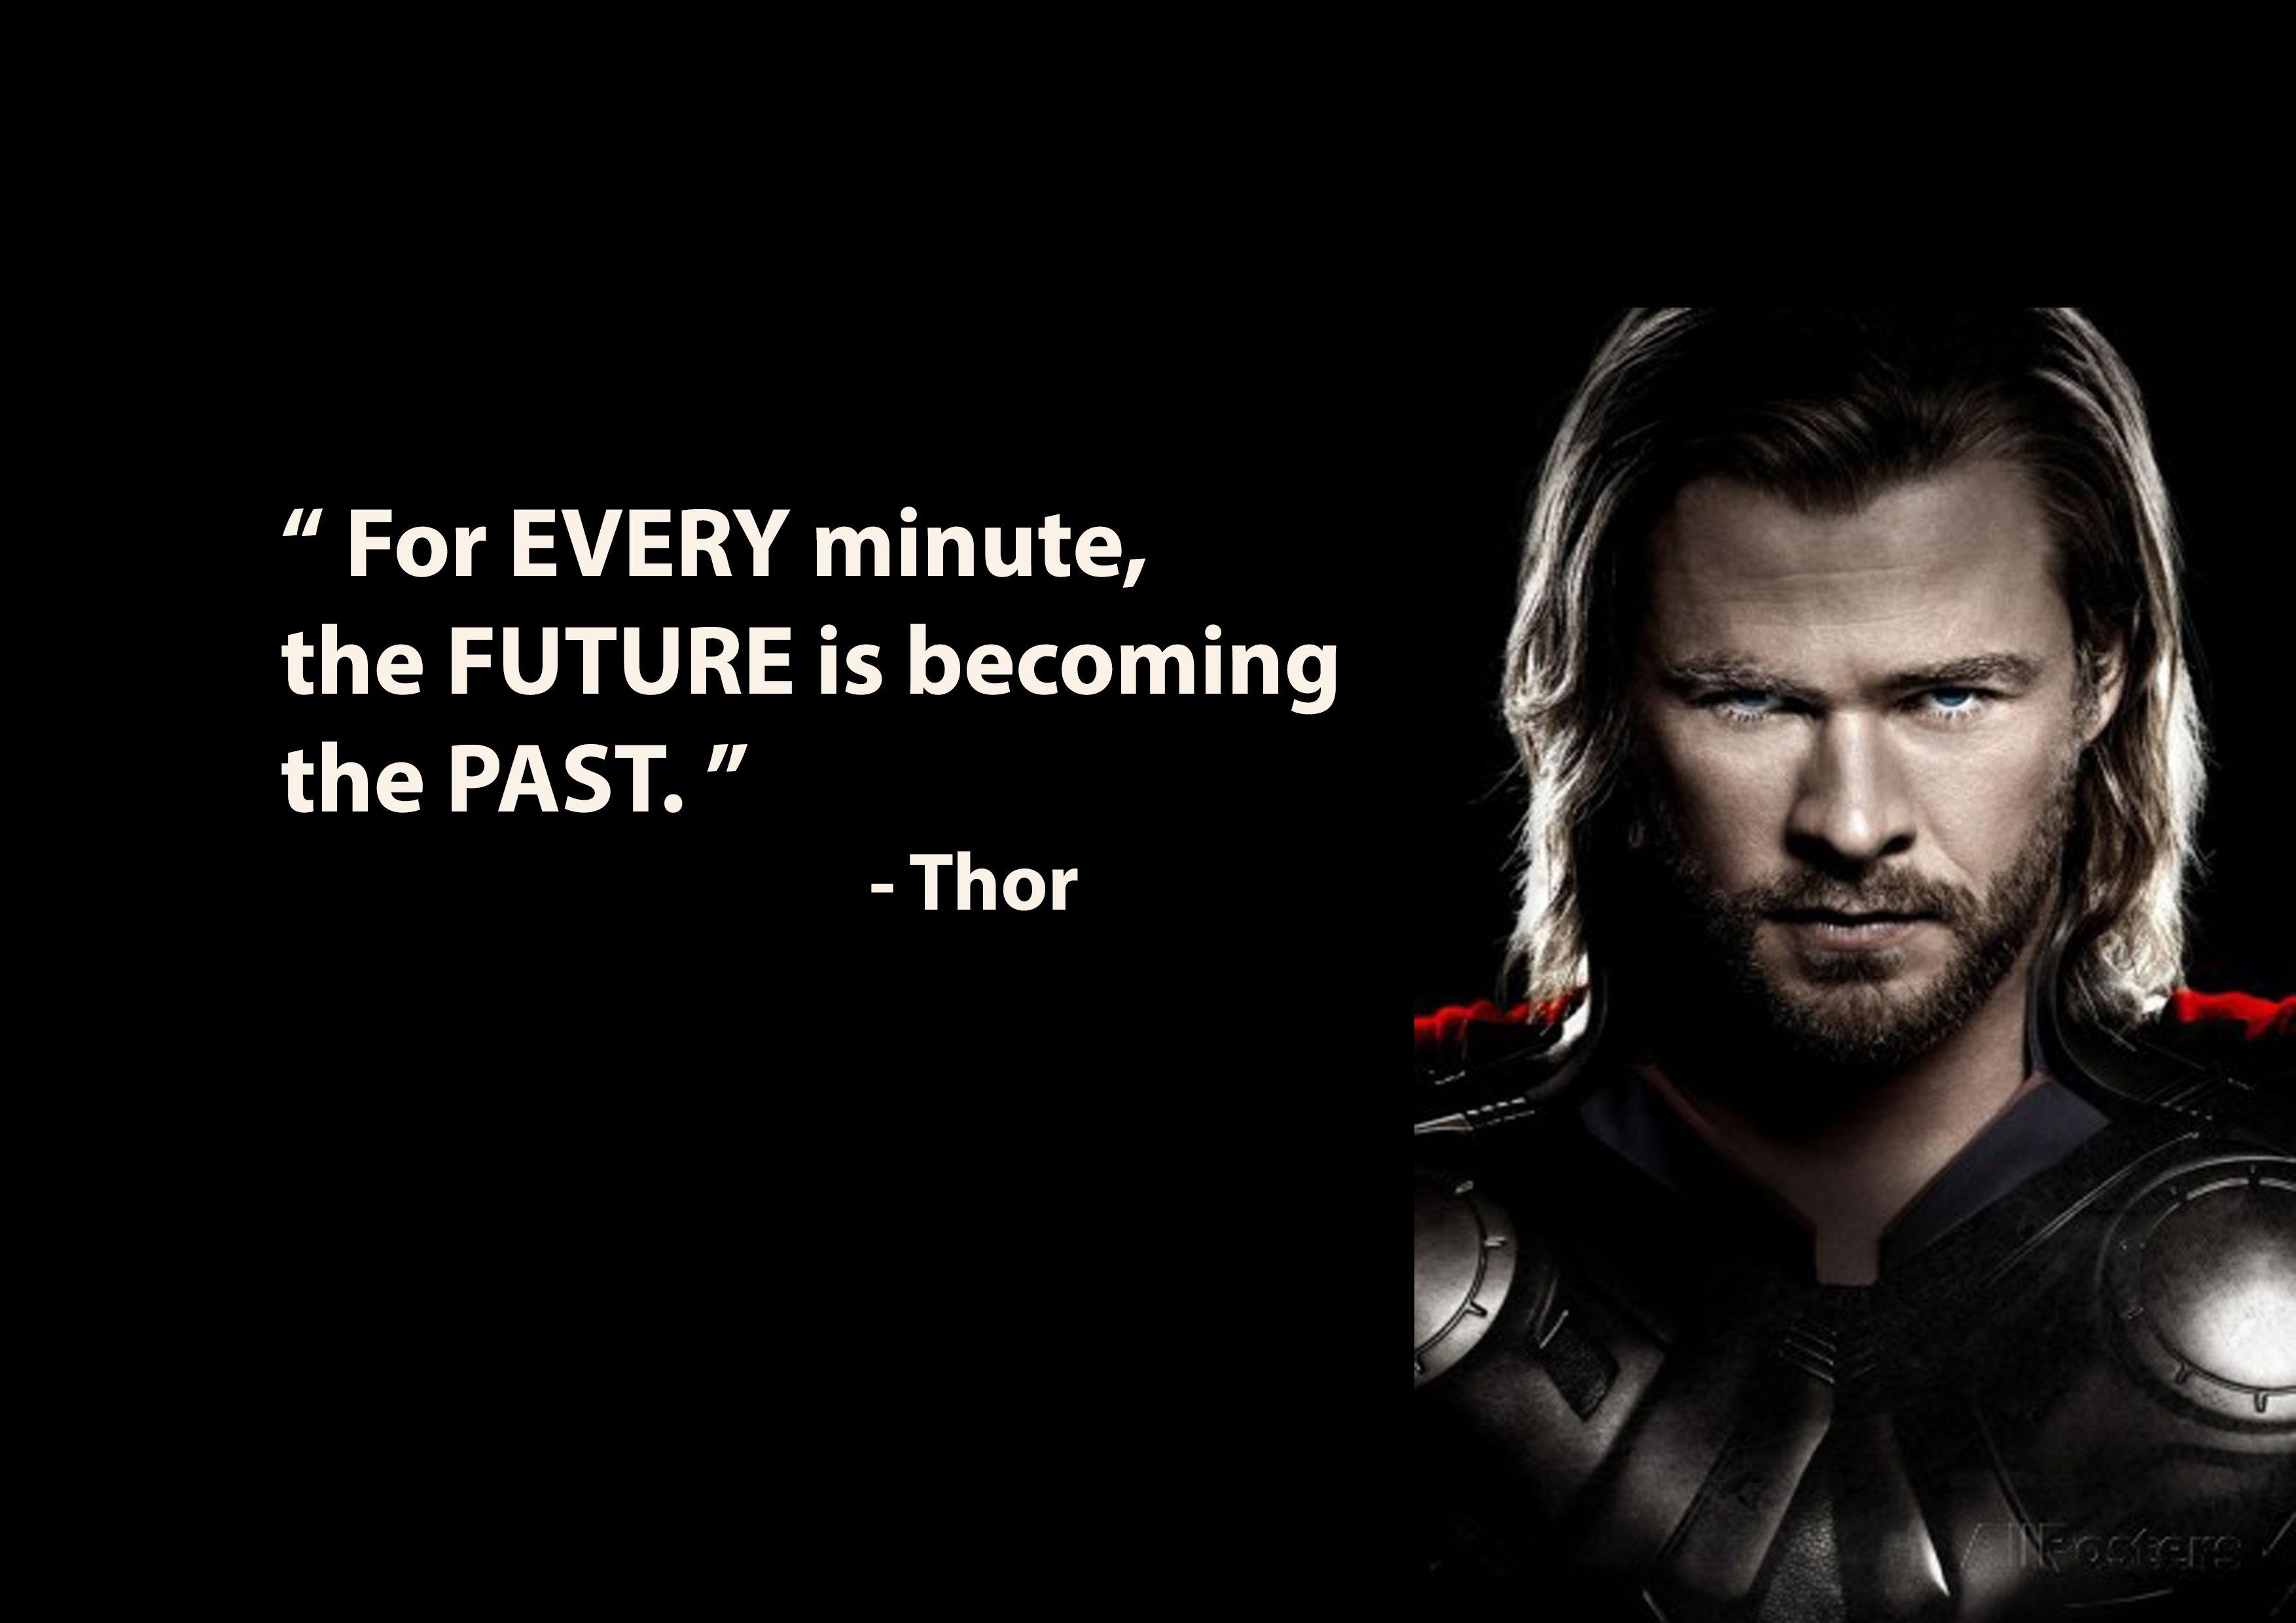 Pin by Lauren Stringer on Marvel Marvel quotes, Thor